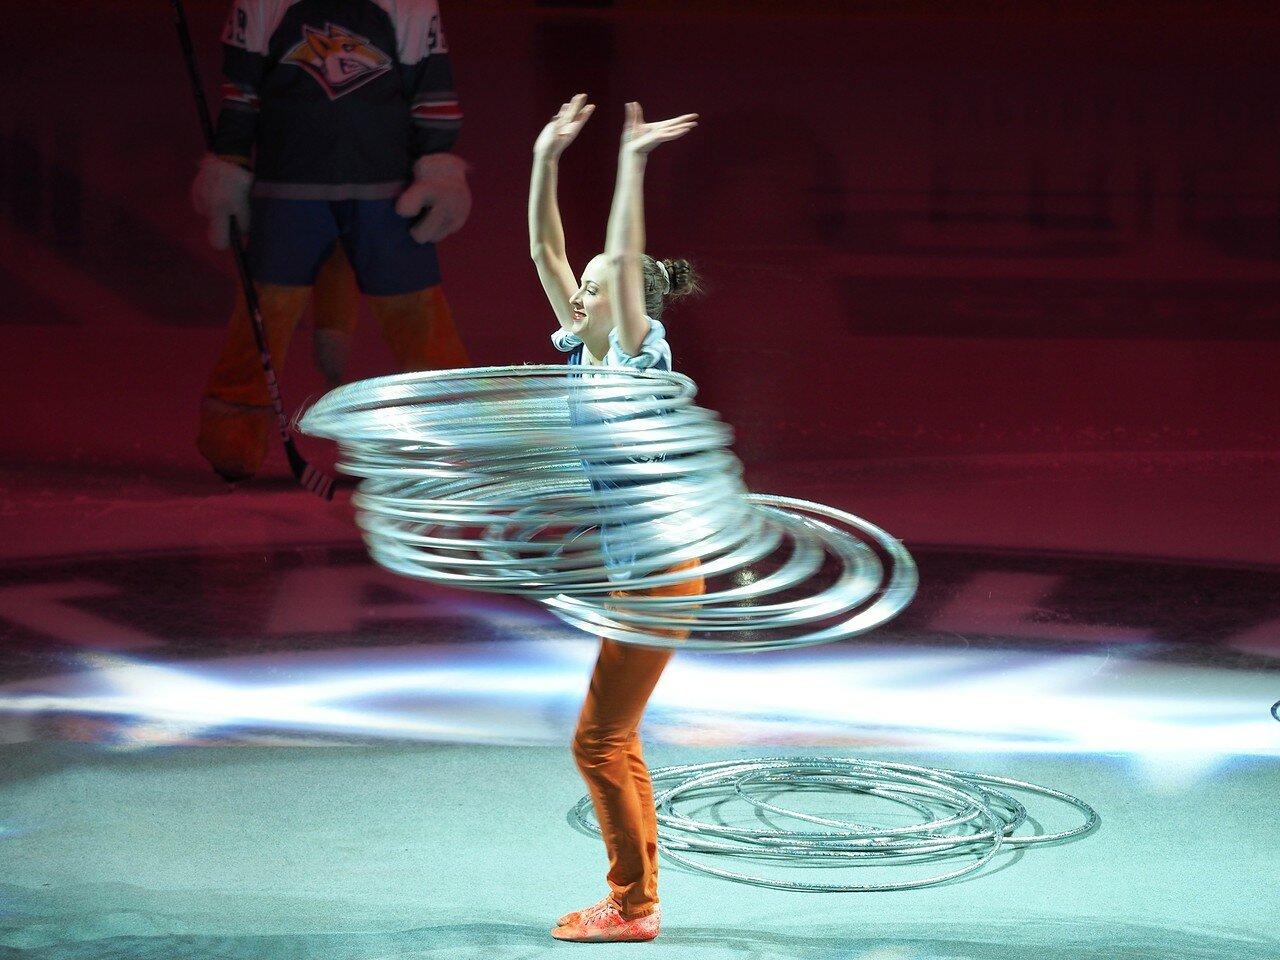 59Плей-офф 2016 Восток Финал Металлург - Салават Юлаев 23.03.2016